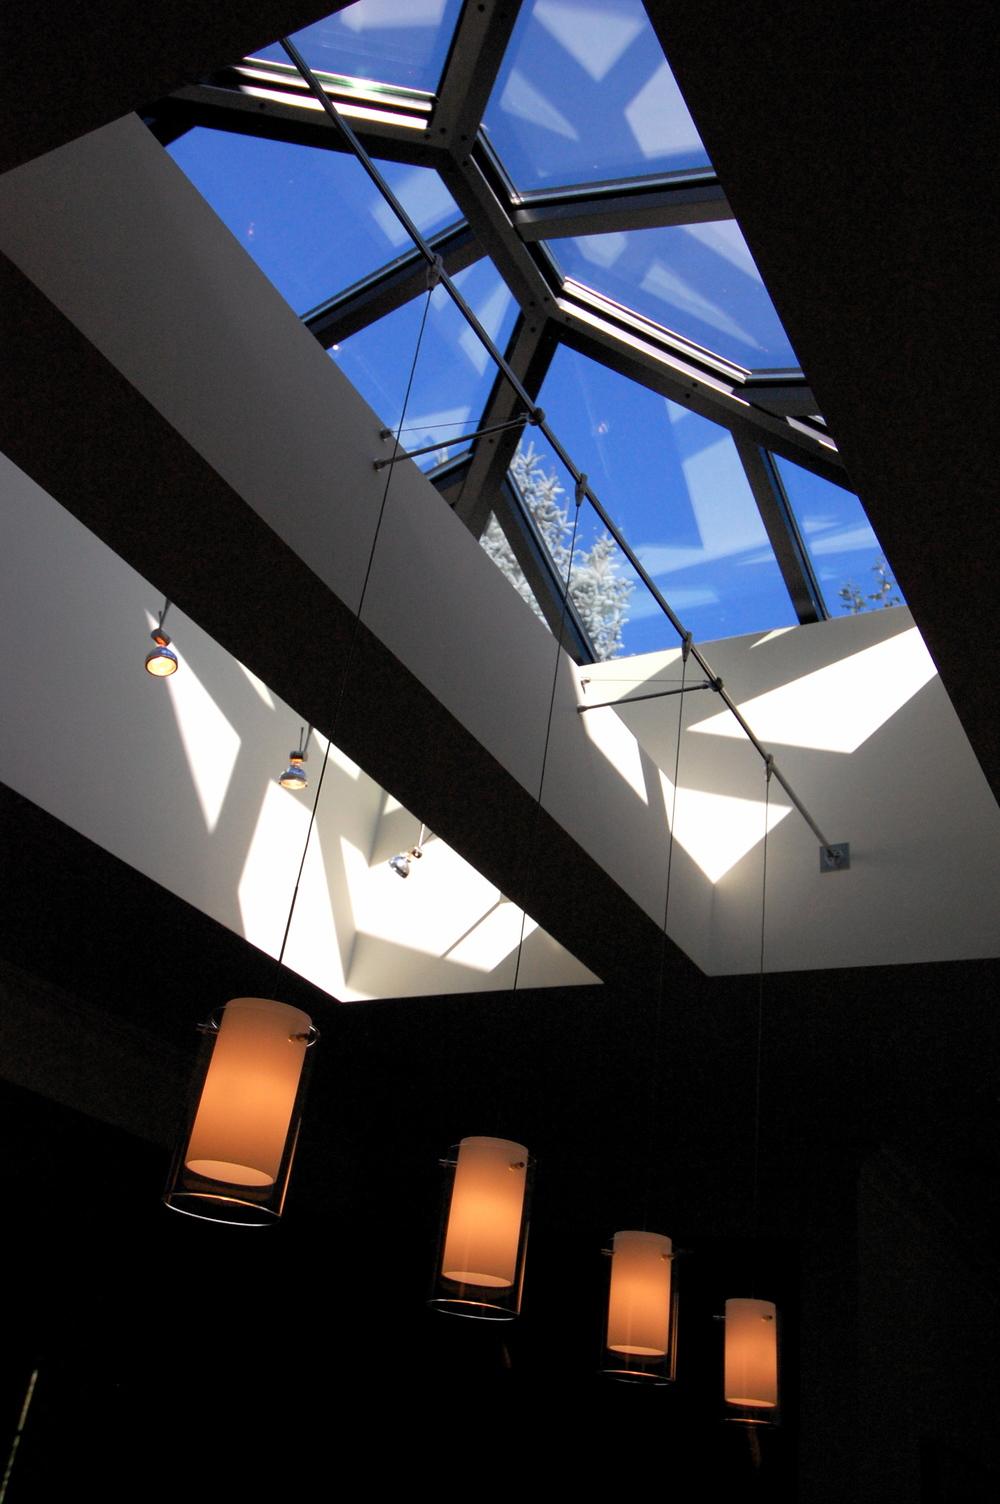 McM_skylight.JPG